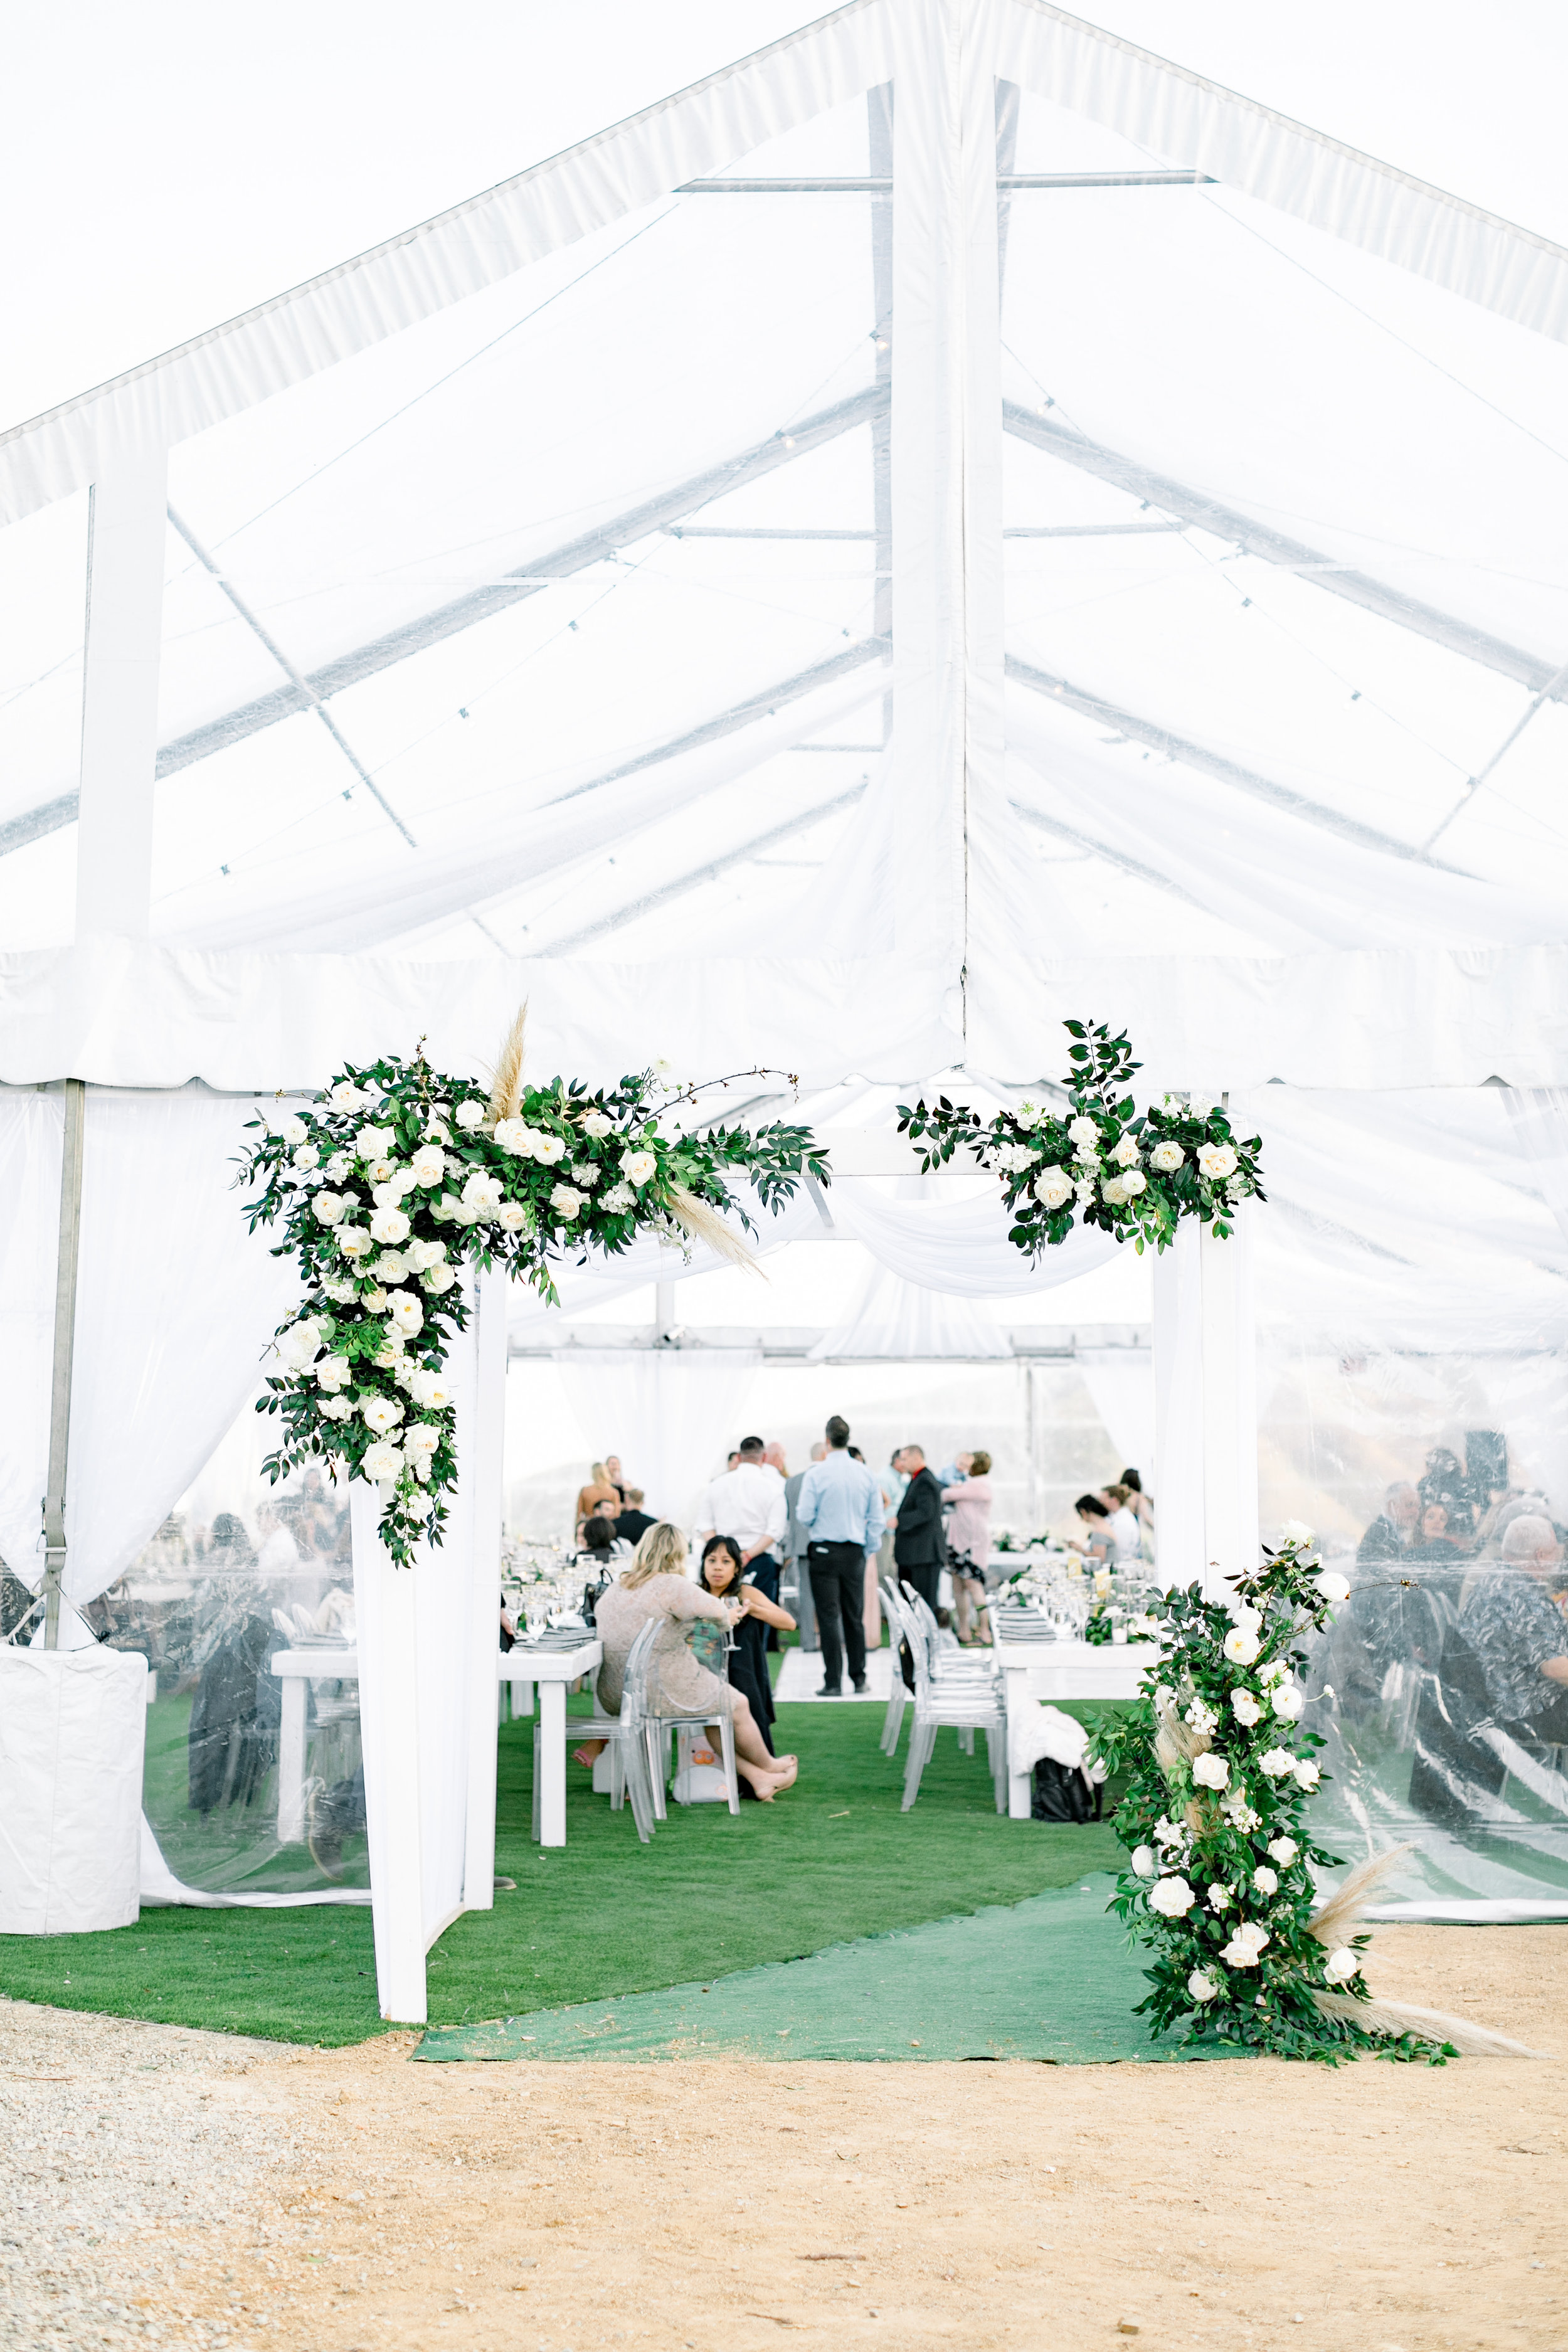 Levi & Amelia's Wedding - Natalie Schutt Photography - Details-64.jpg